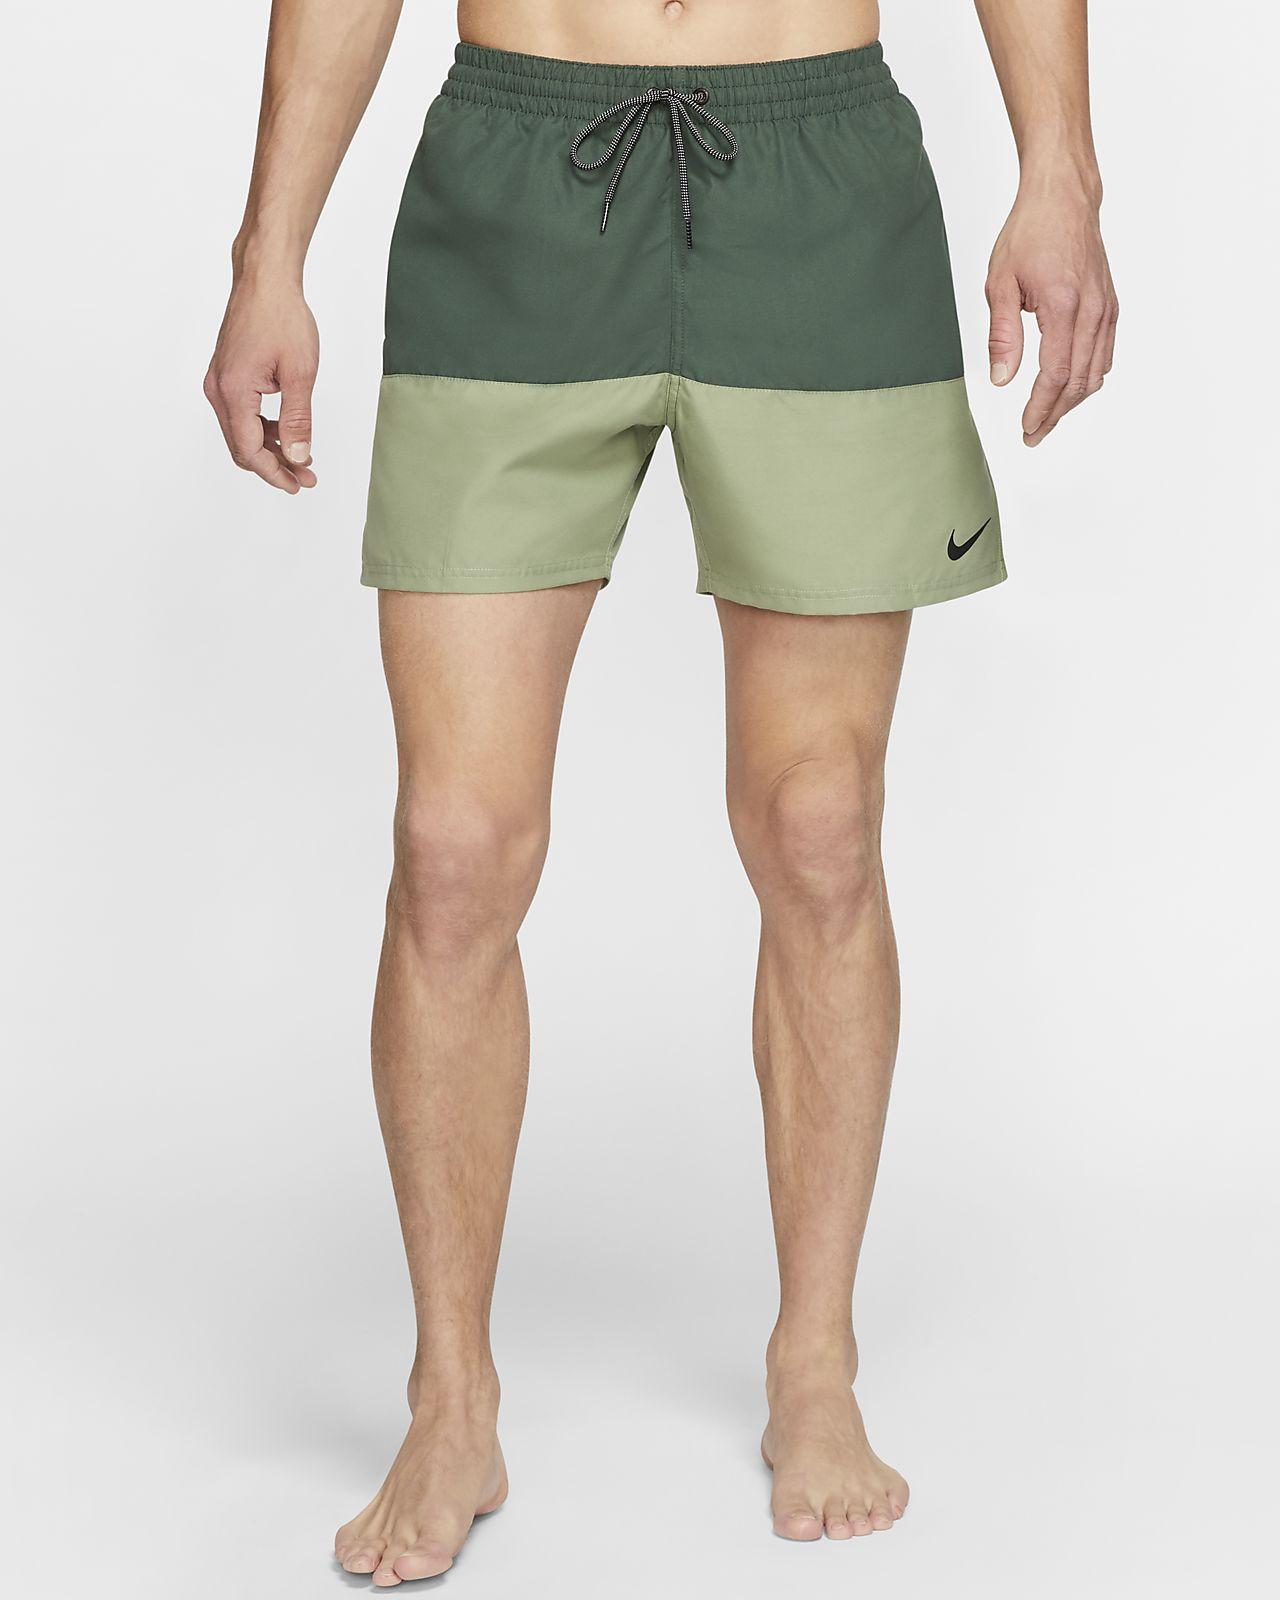 Nike Split Breaker Pantalons curts de 13 cm - Home